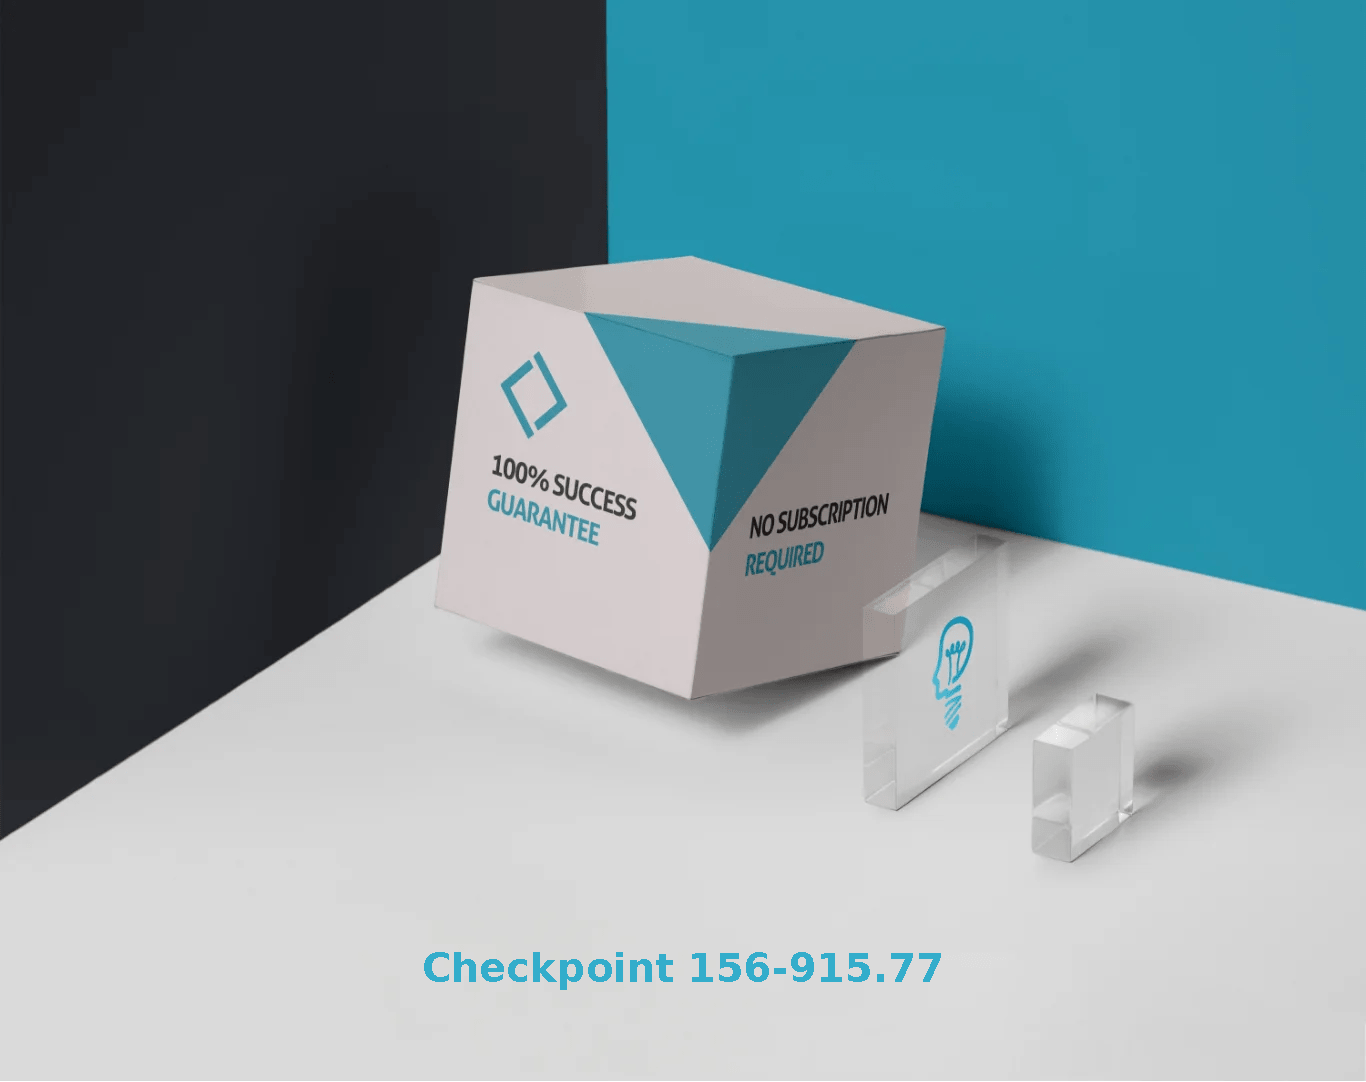 Checkpoint 156-915.77 Exams